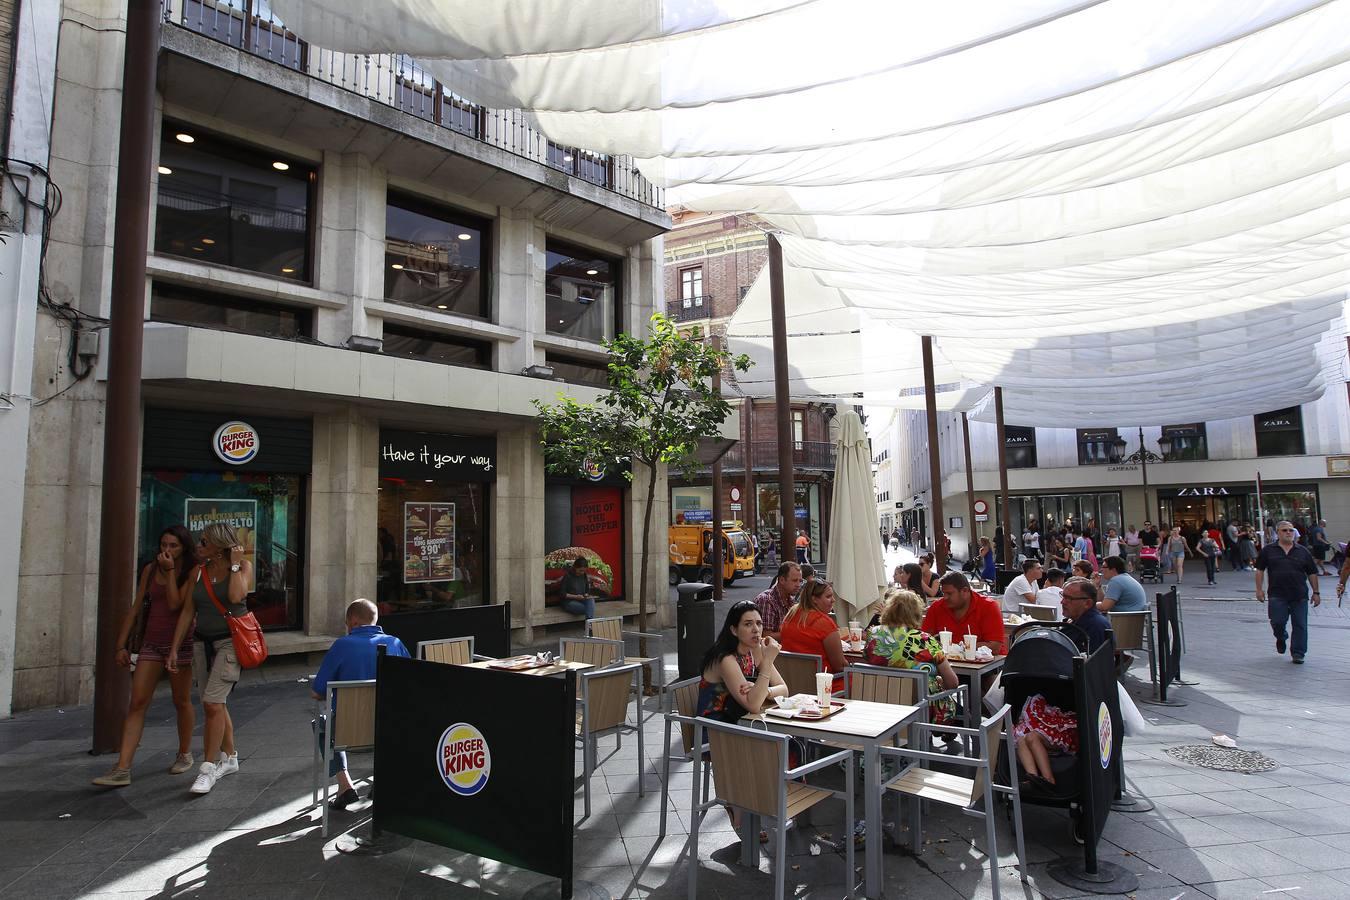 Las calles de sevilla saturadas por los veladores for Cartelera avenida sevilla